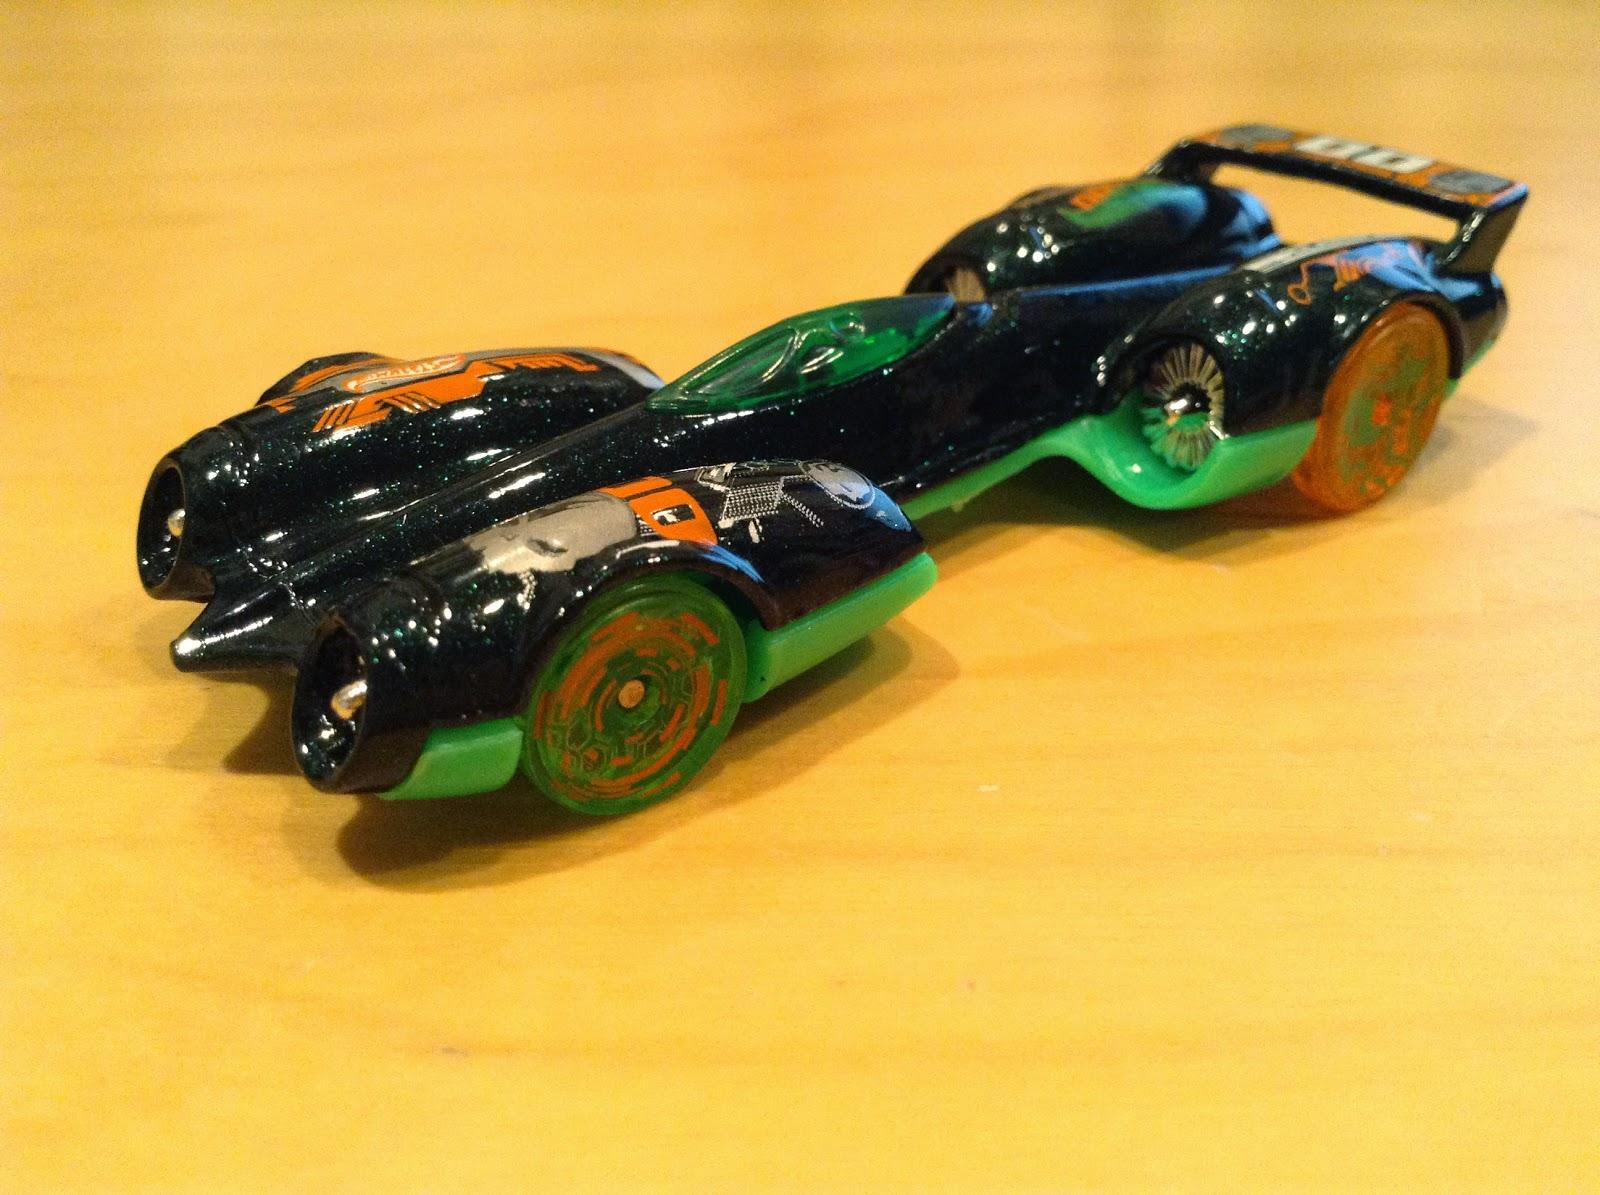 Hot Wheels High Speed Racing Wheels High Speed Wheels